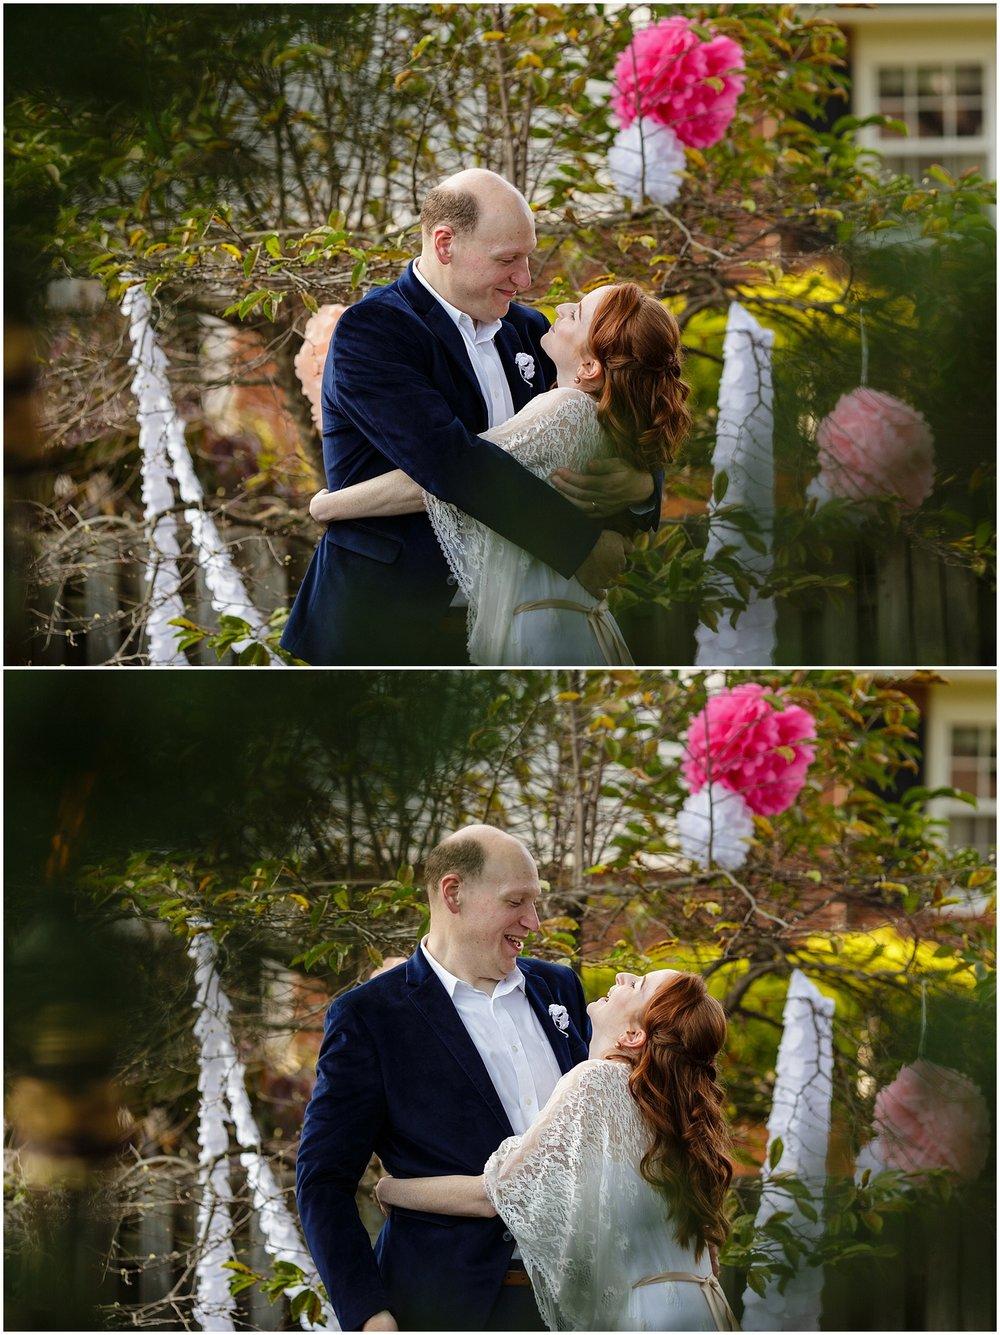 Berks County Pennsylvania Backyard DIY Wedding Photographer